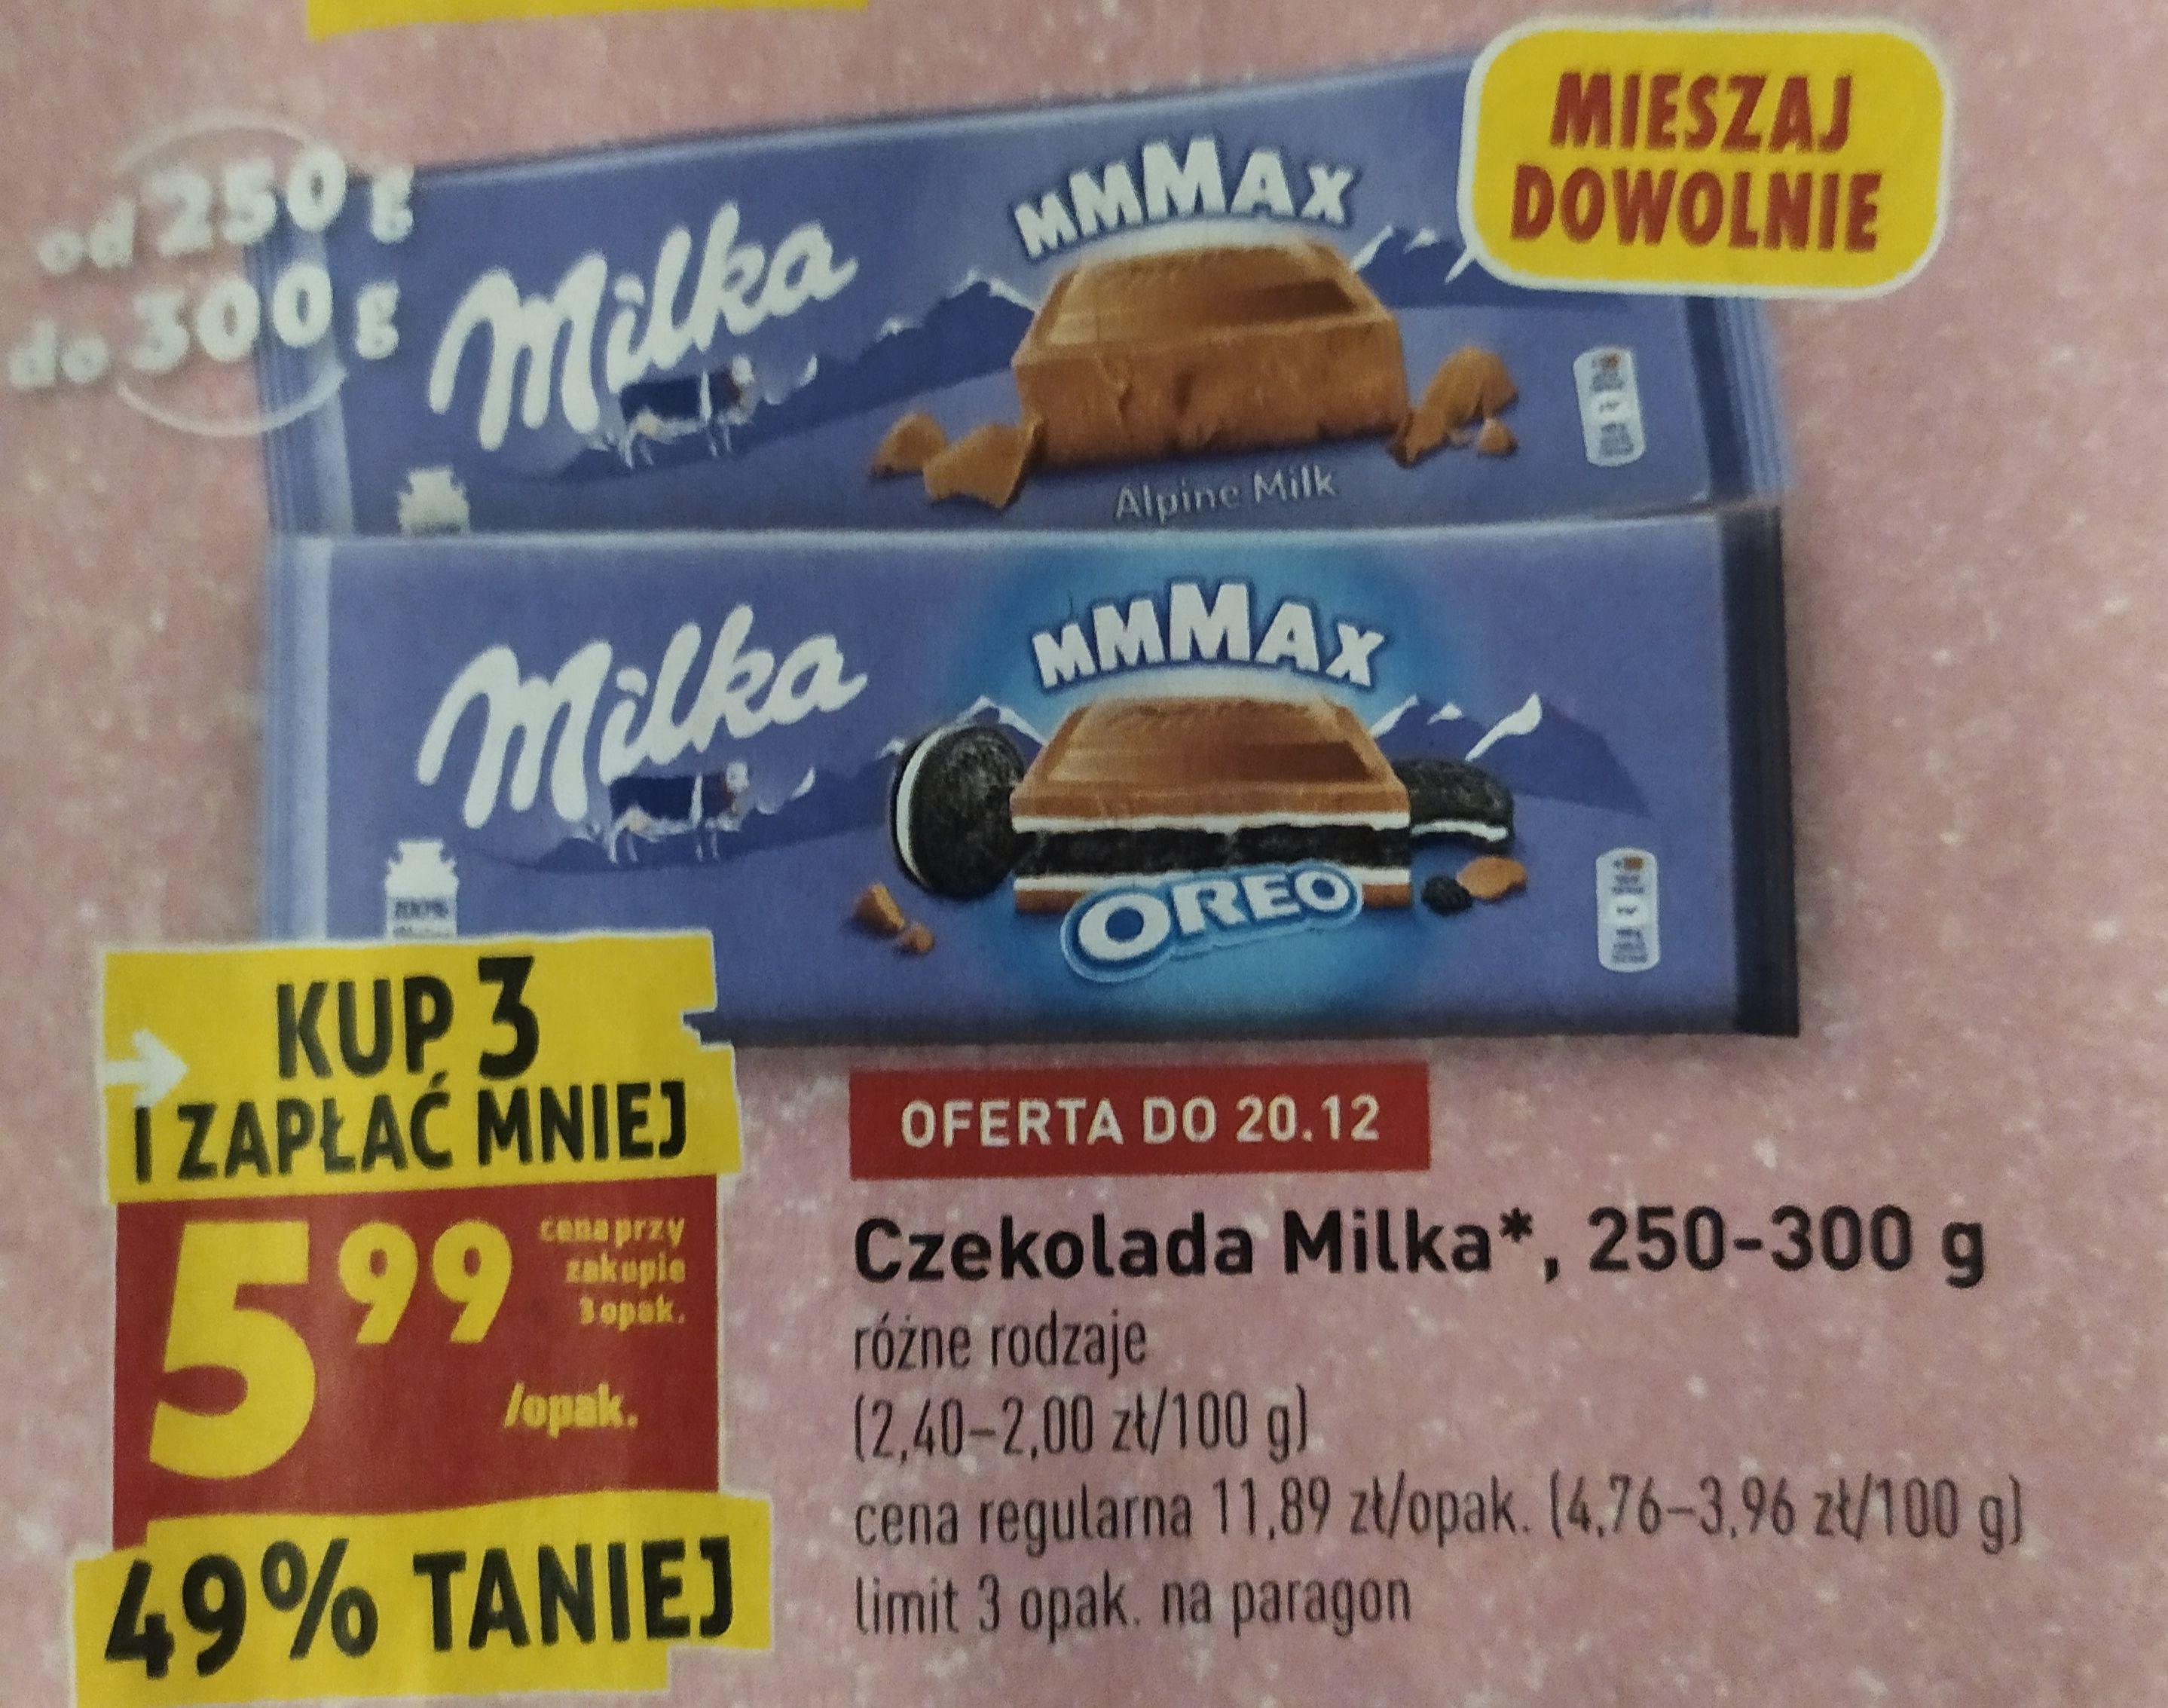 Czekolada Milka 250-300g - Biedronka